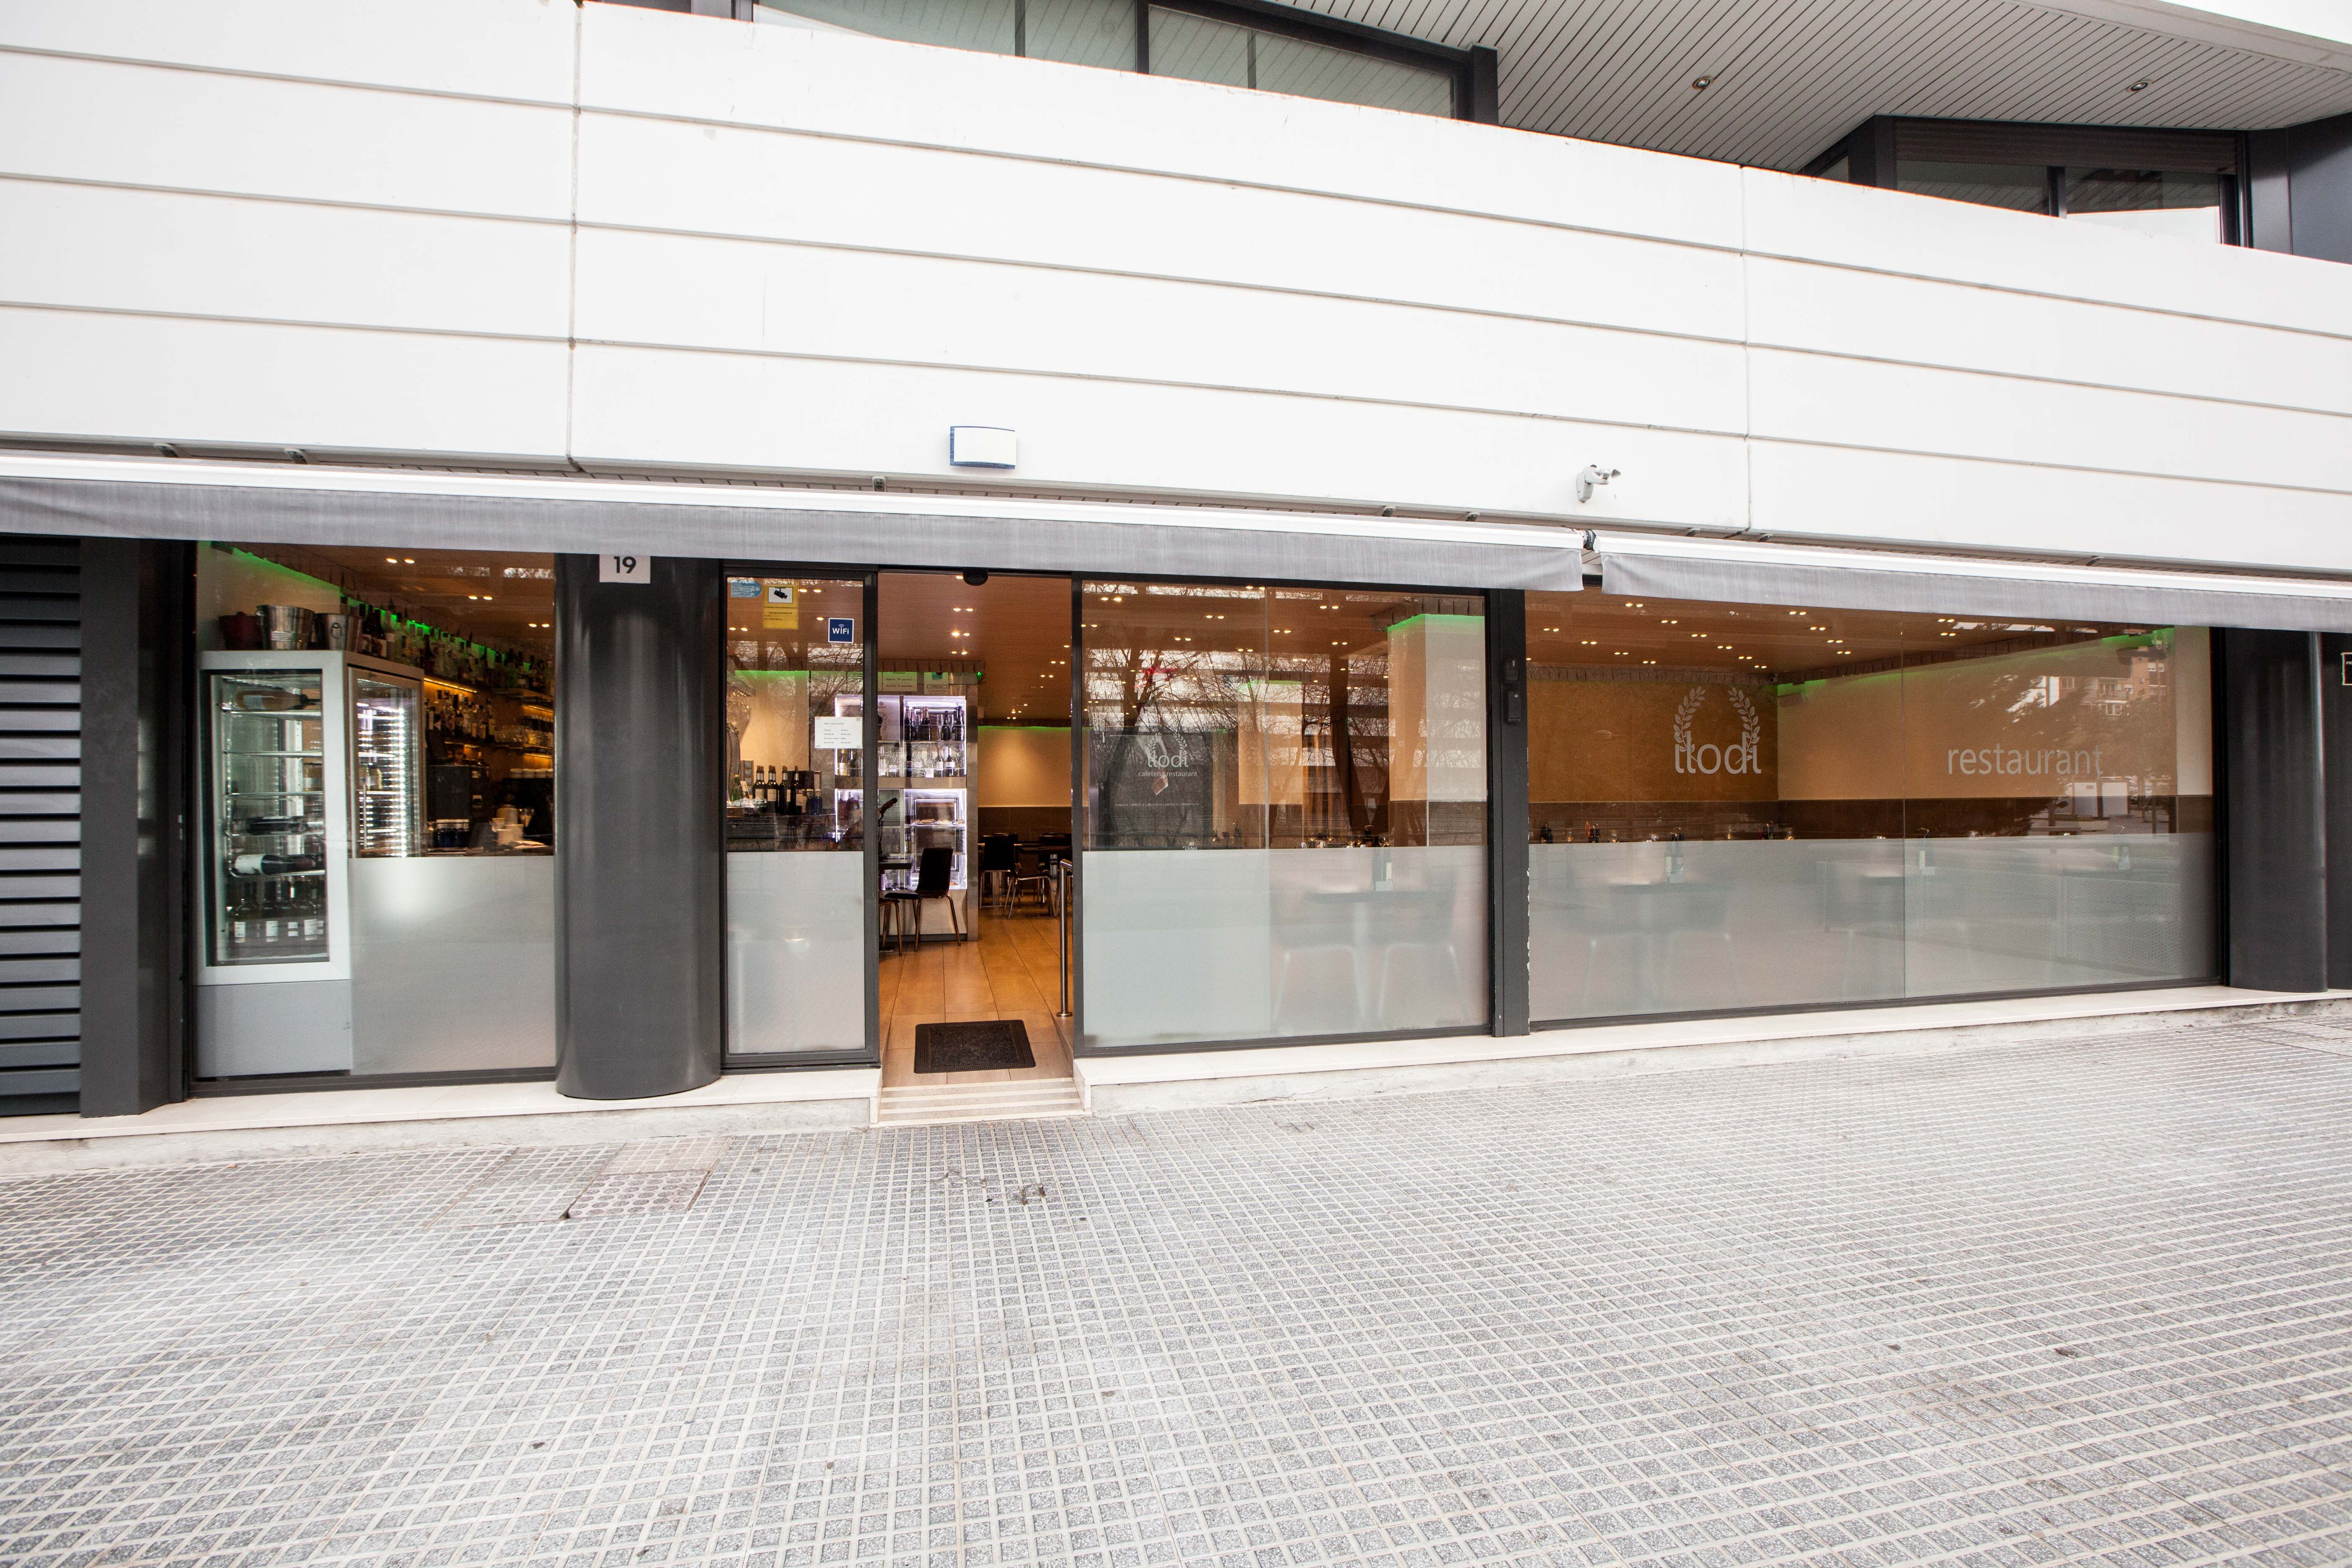 Foto 3 de Restaurante en Barcelona   Restaurante Ilodi